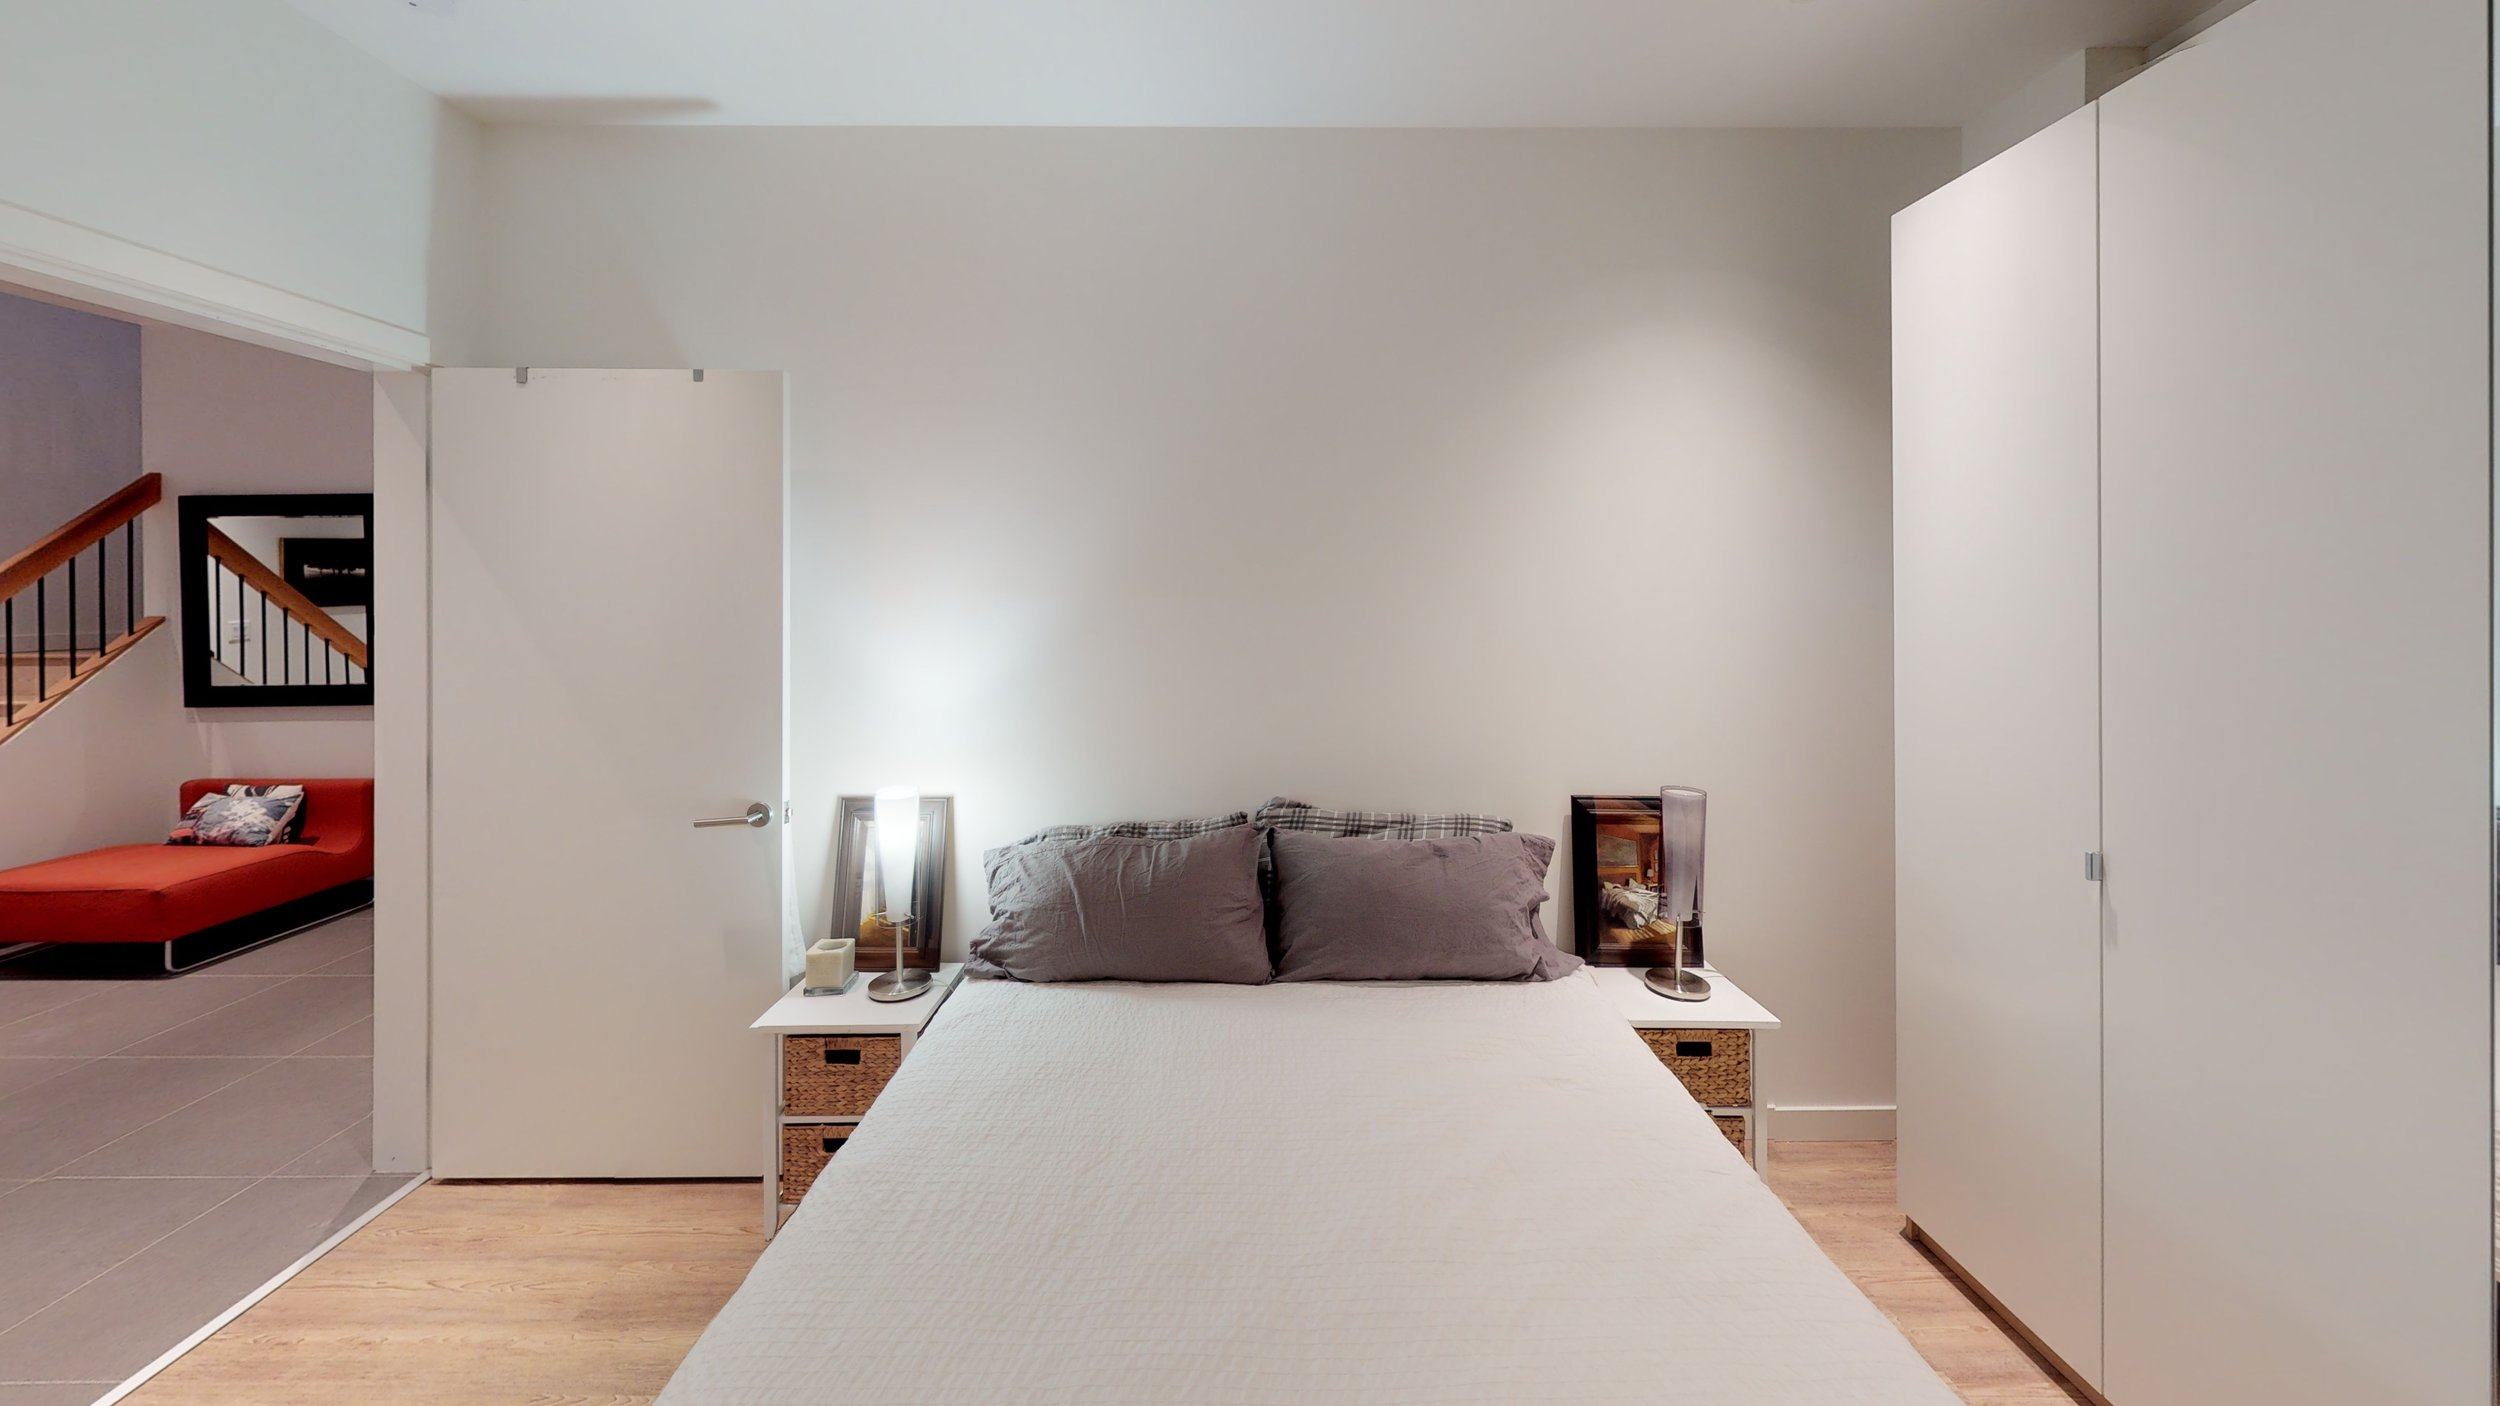 16 Bedroom-4(2).jpg